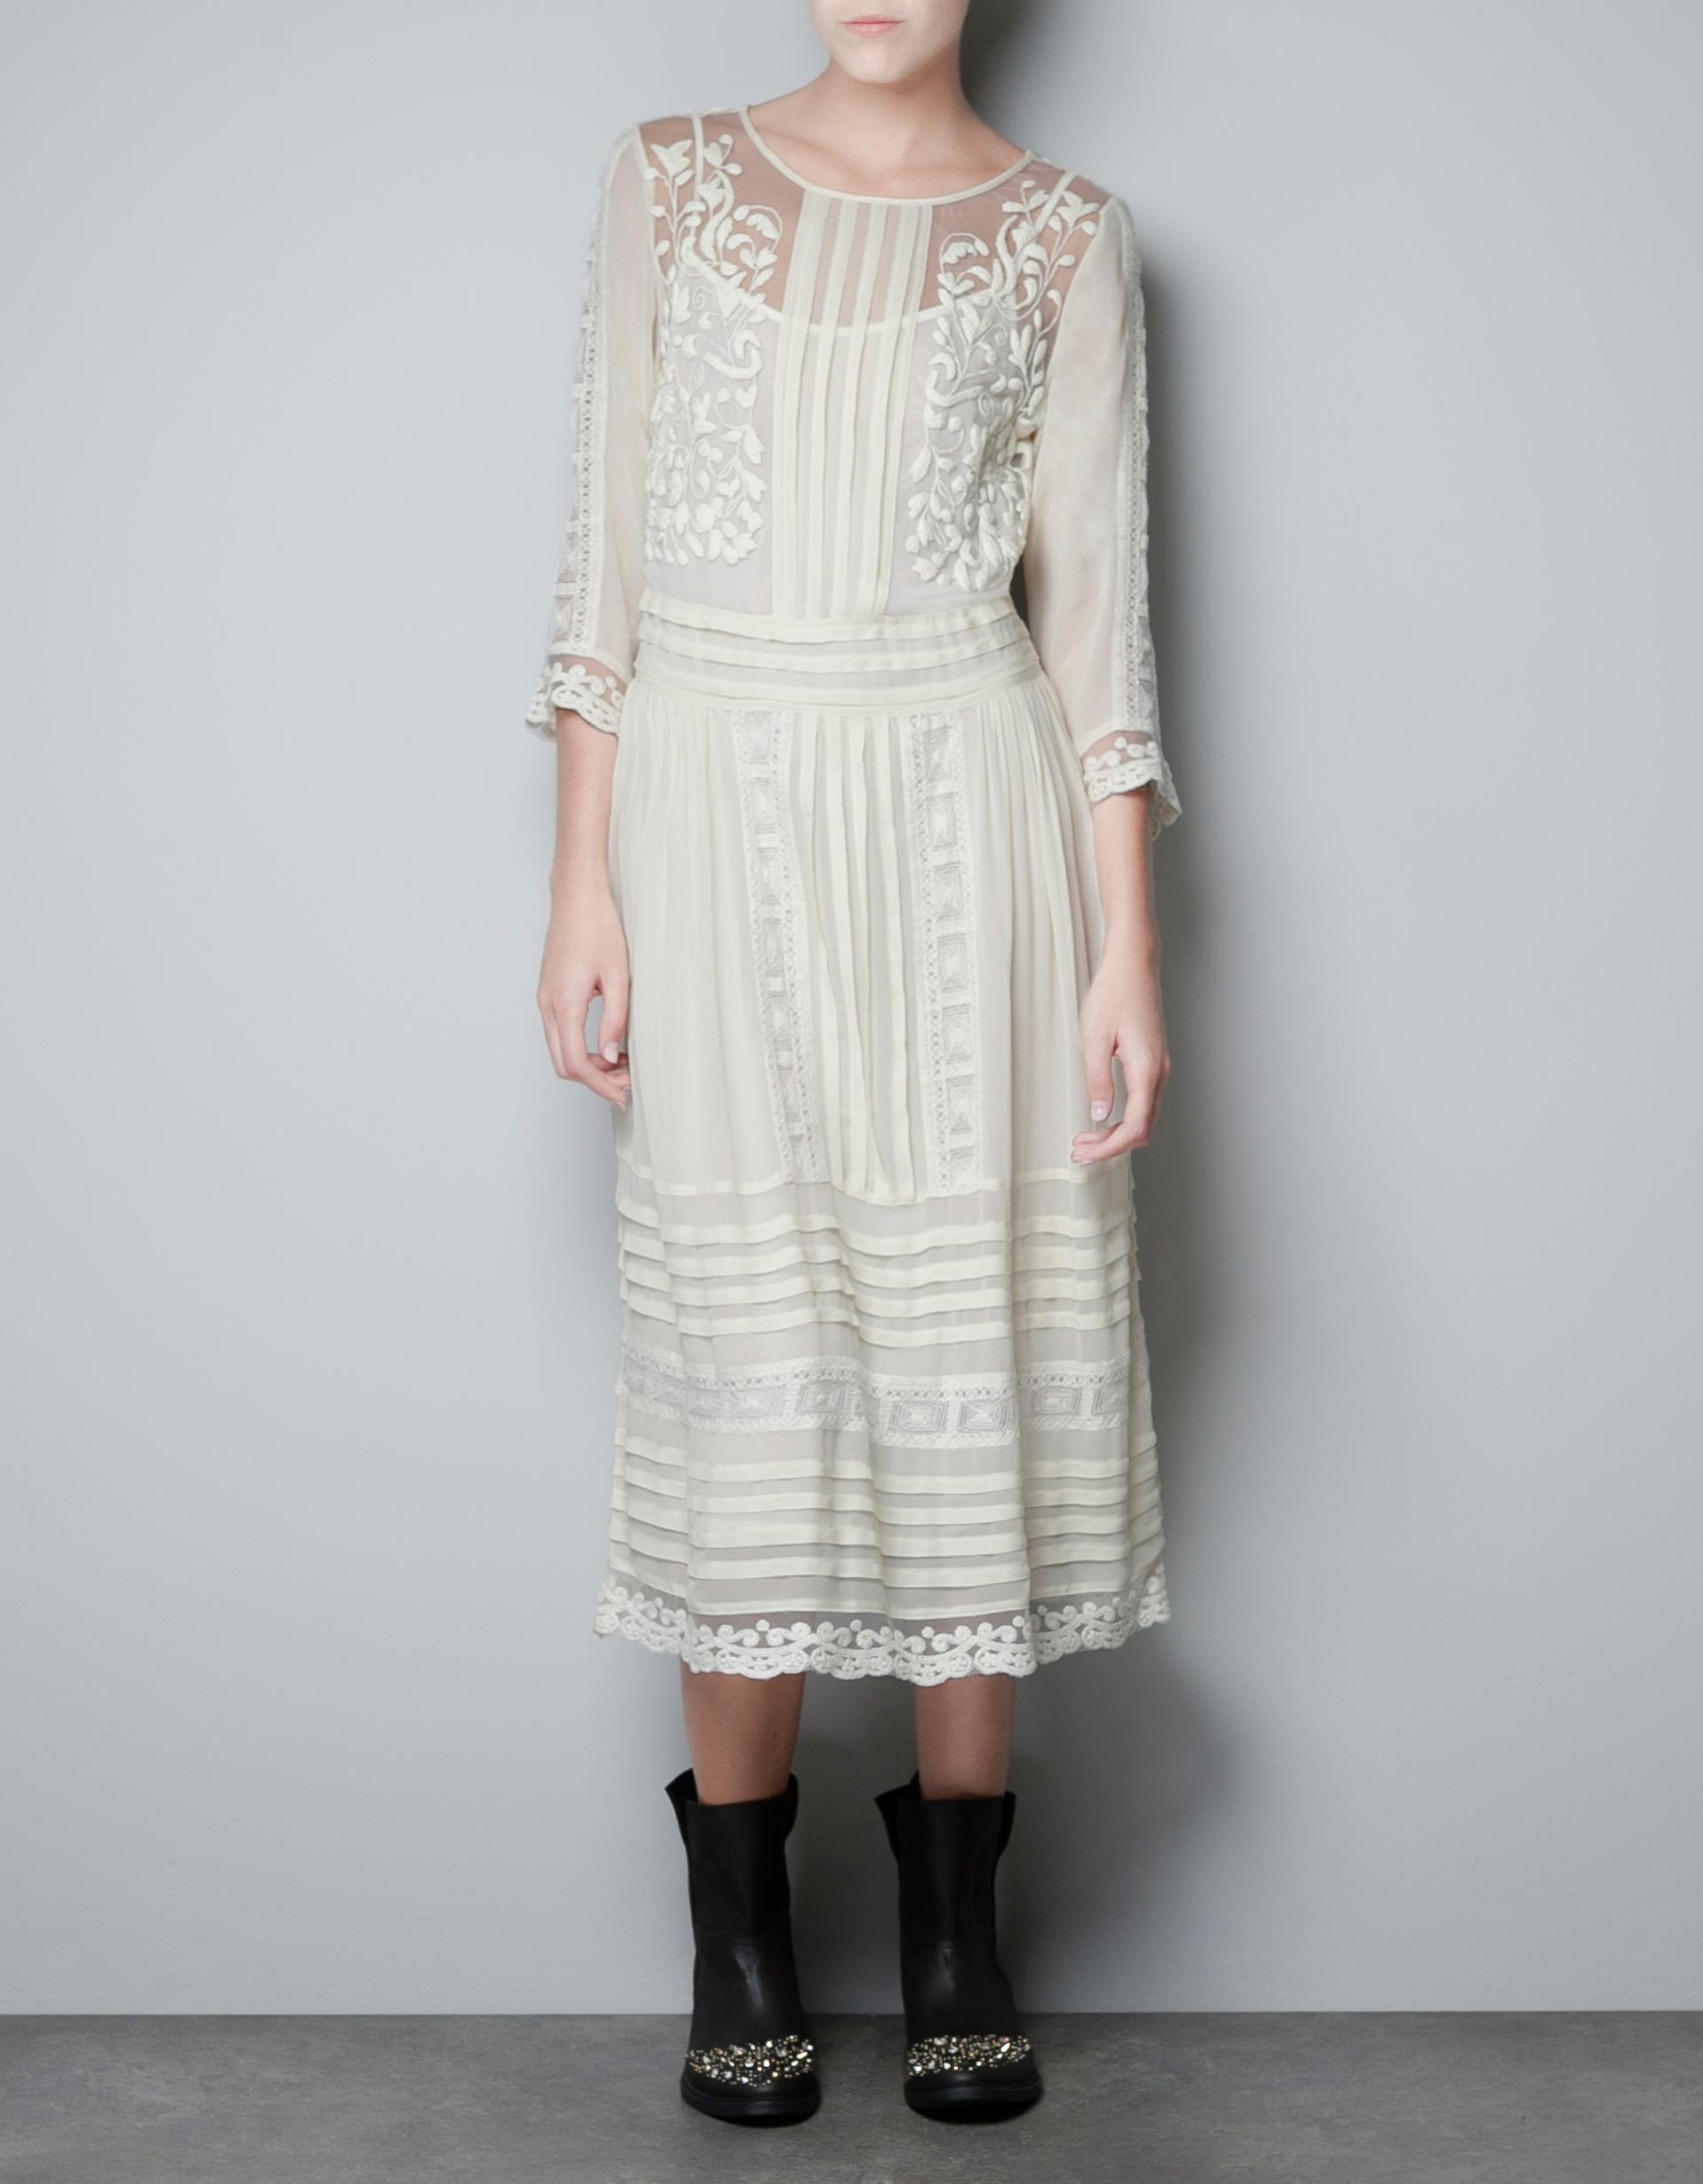 Zara Pin Tuck Embroidered Dress In White (ecru)   Lyst